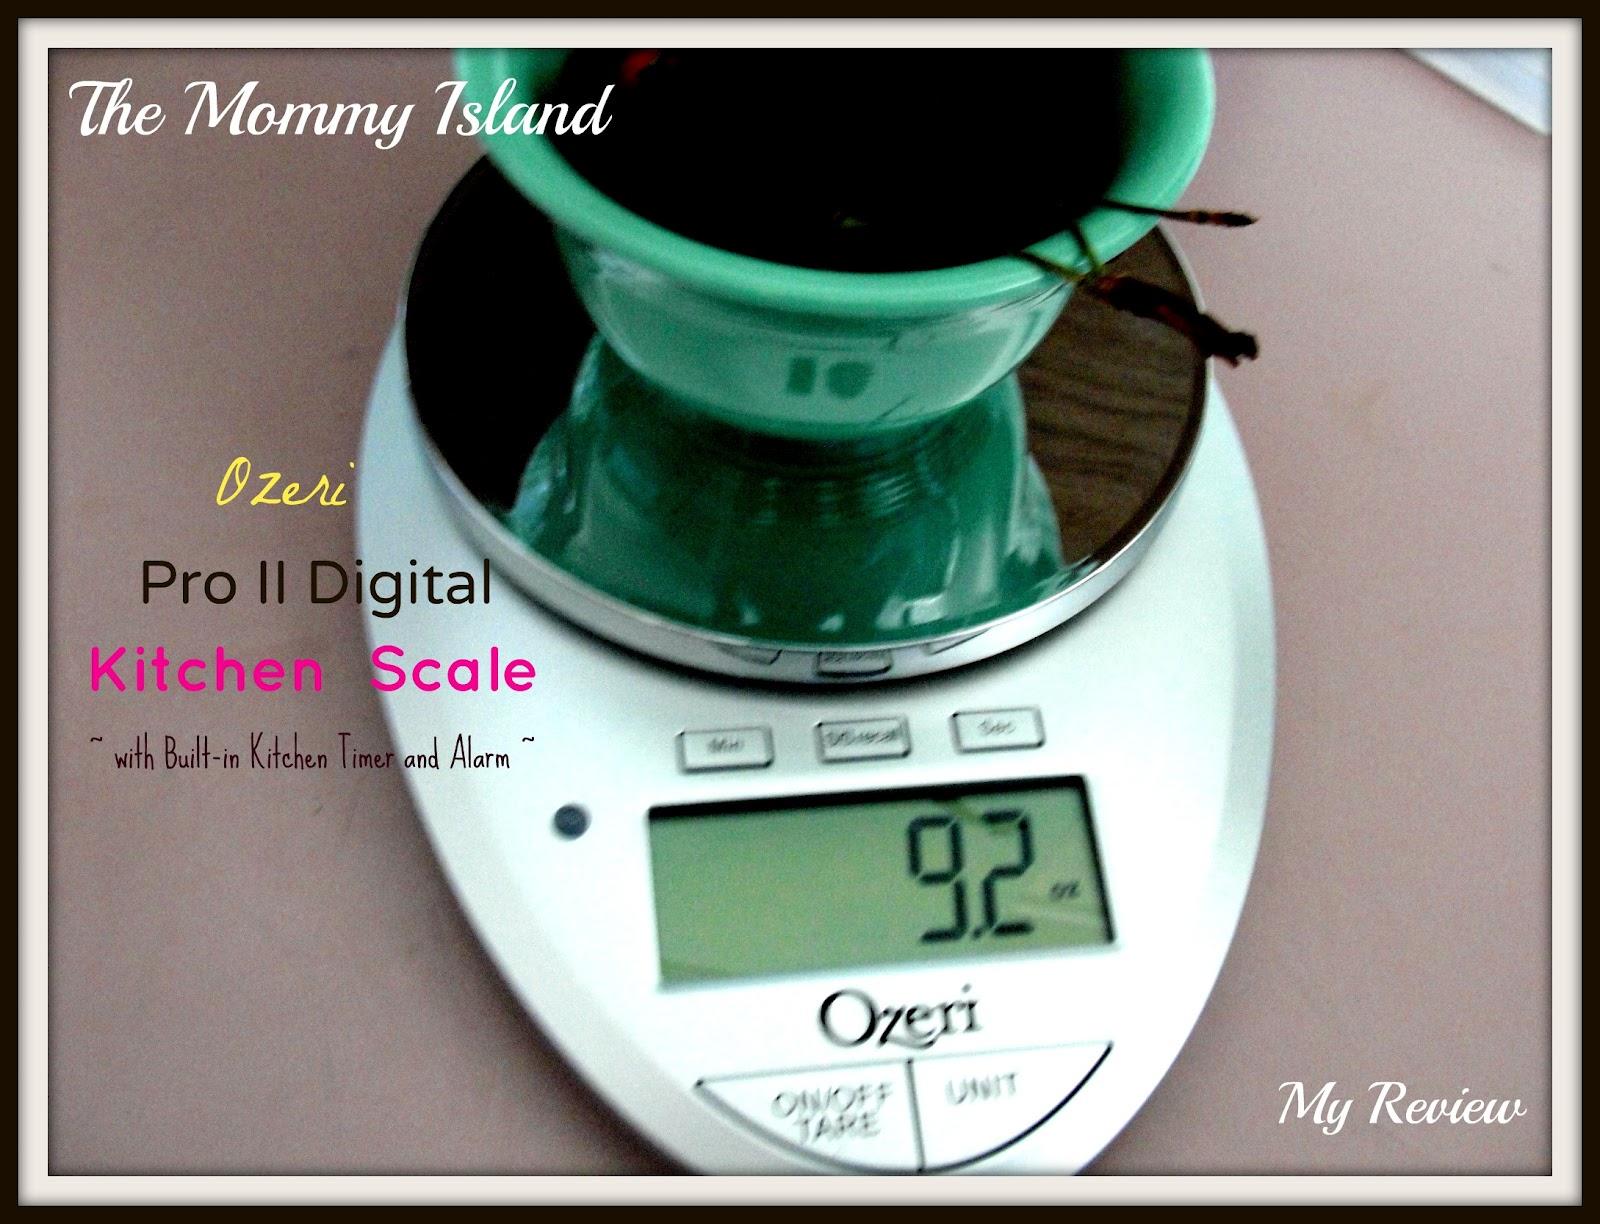 Ozeri Pro Ii Digital Kitchen Scale Review